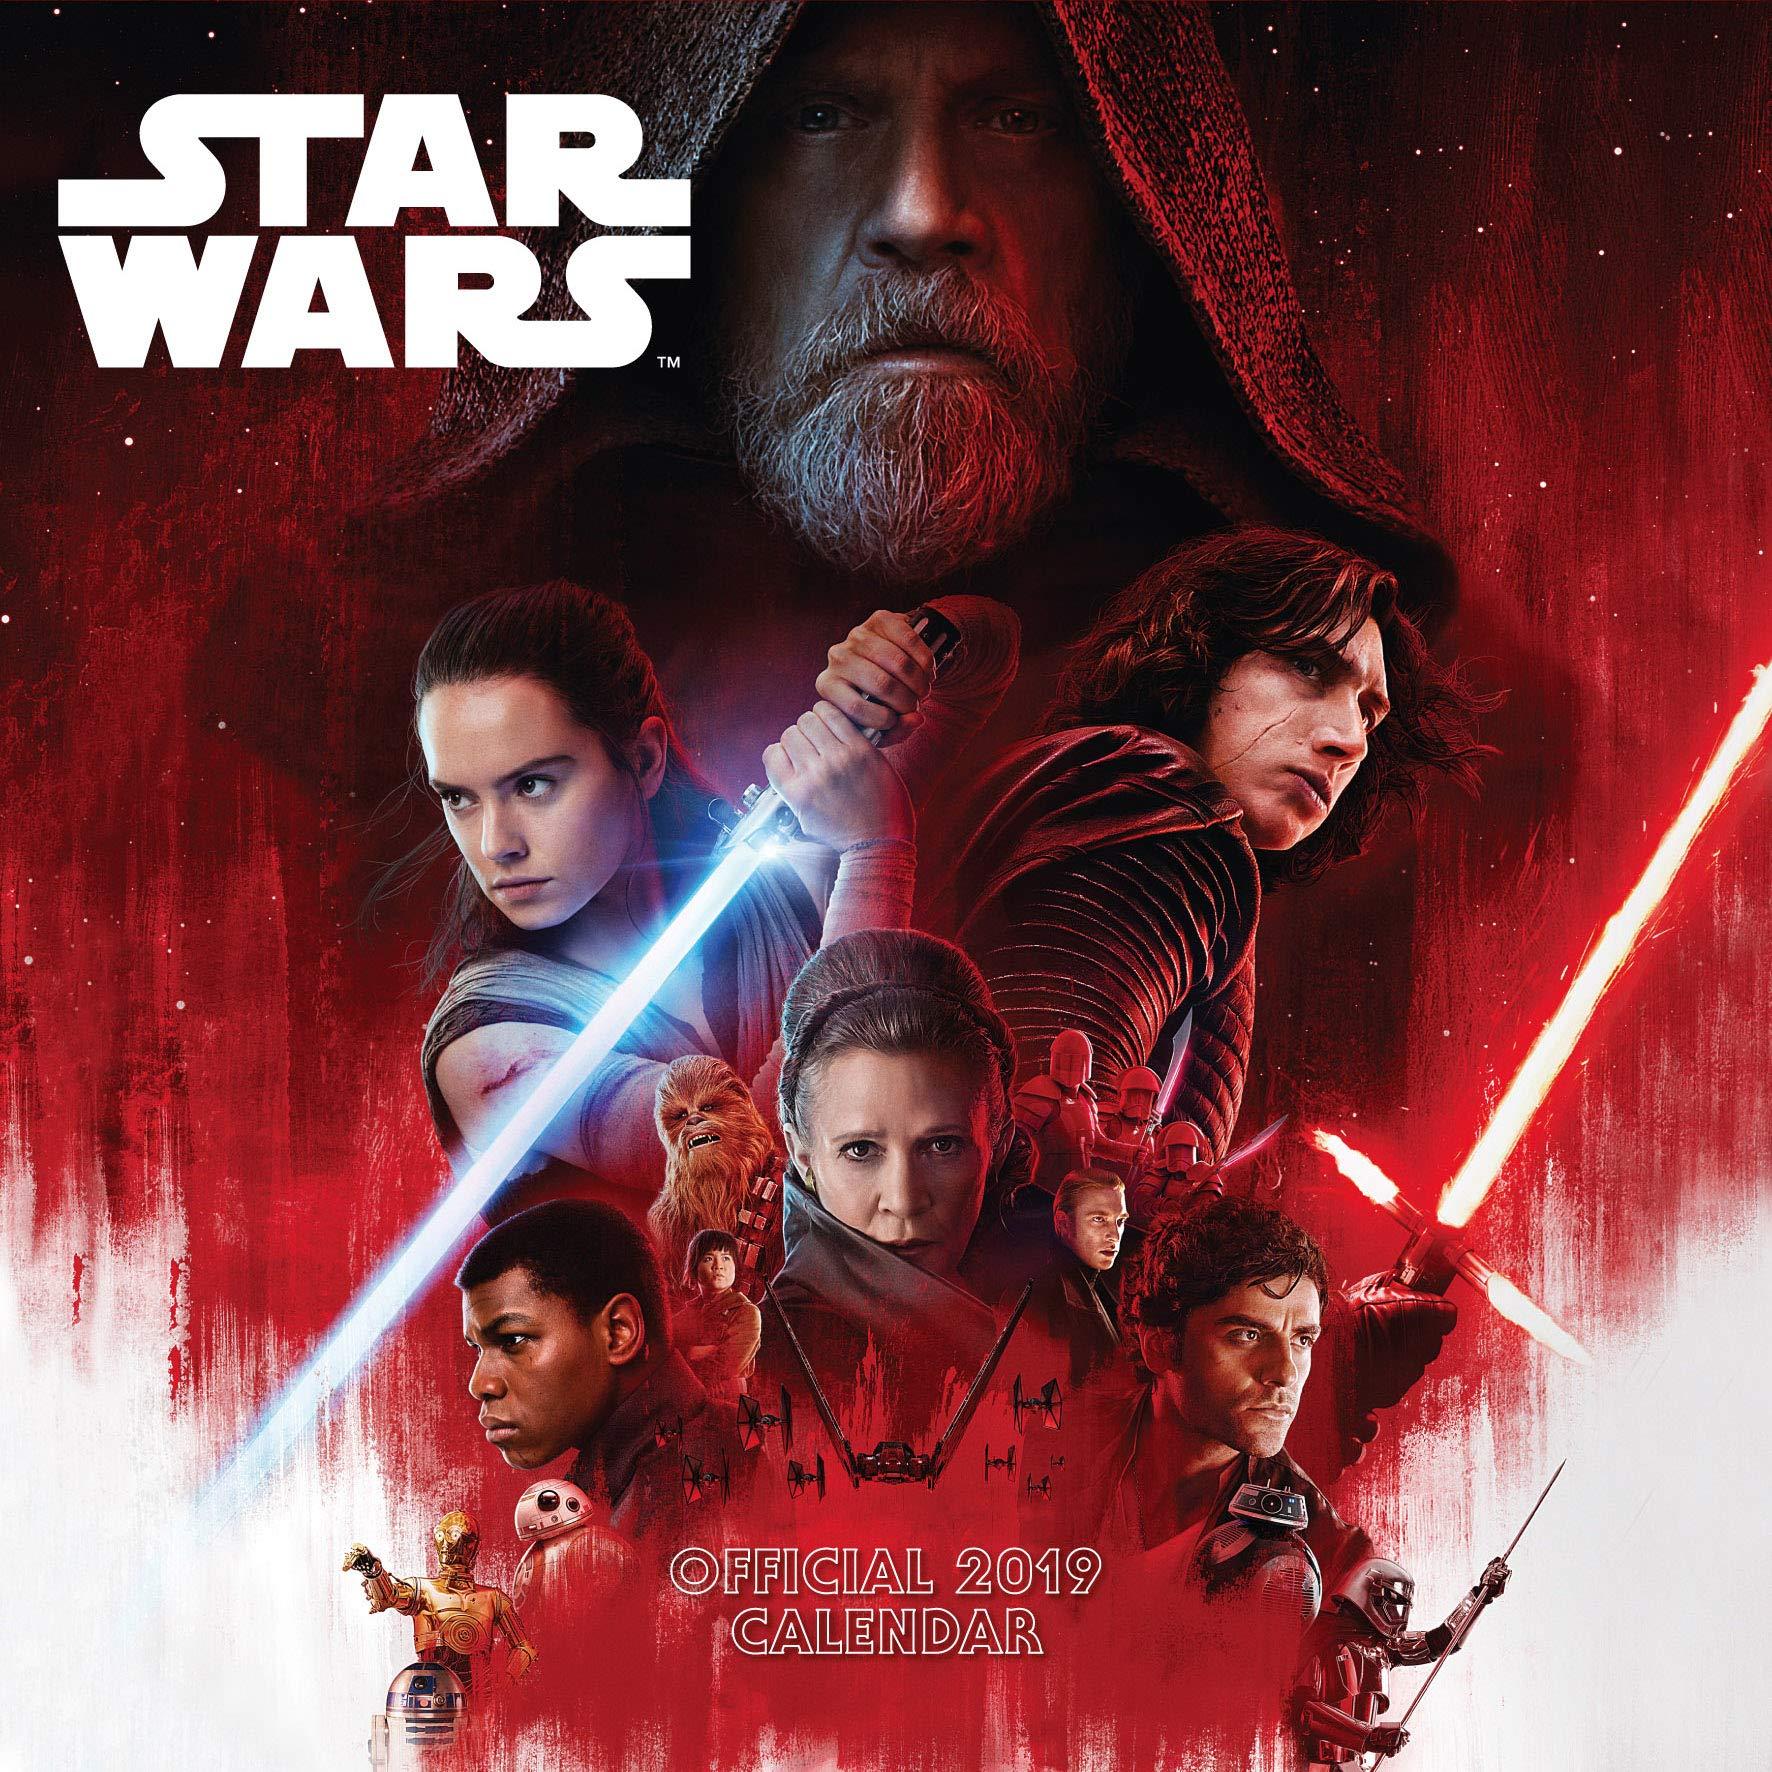 Star Wars: Episode 8 The Last Jedi Official 2019 Calendar - Square Wall Calendar Format Calendar – Wall Calendar, 20 Sep 2018 Danilo 1785496662 Unclassifiable: WZ BIC Address Books